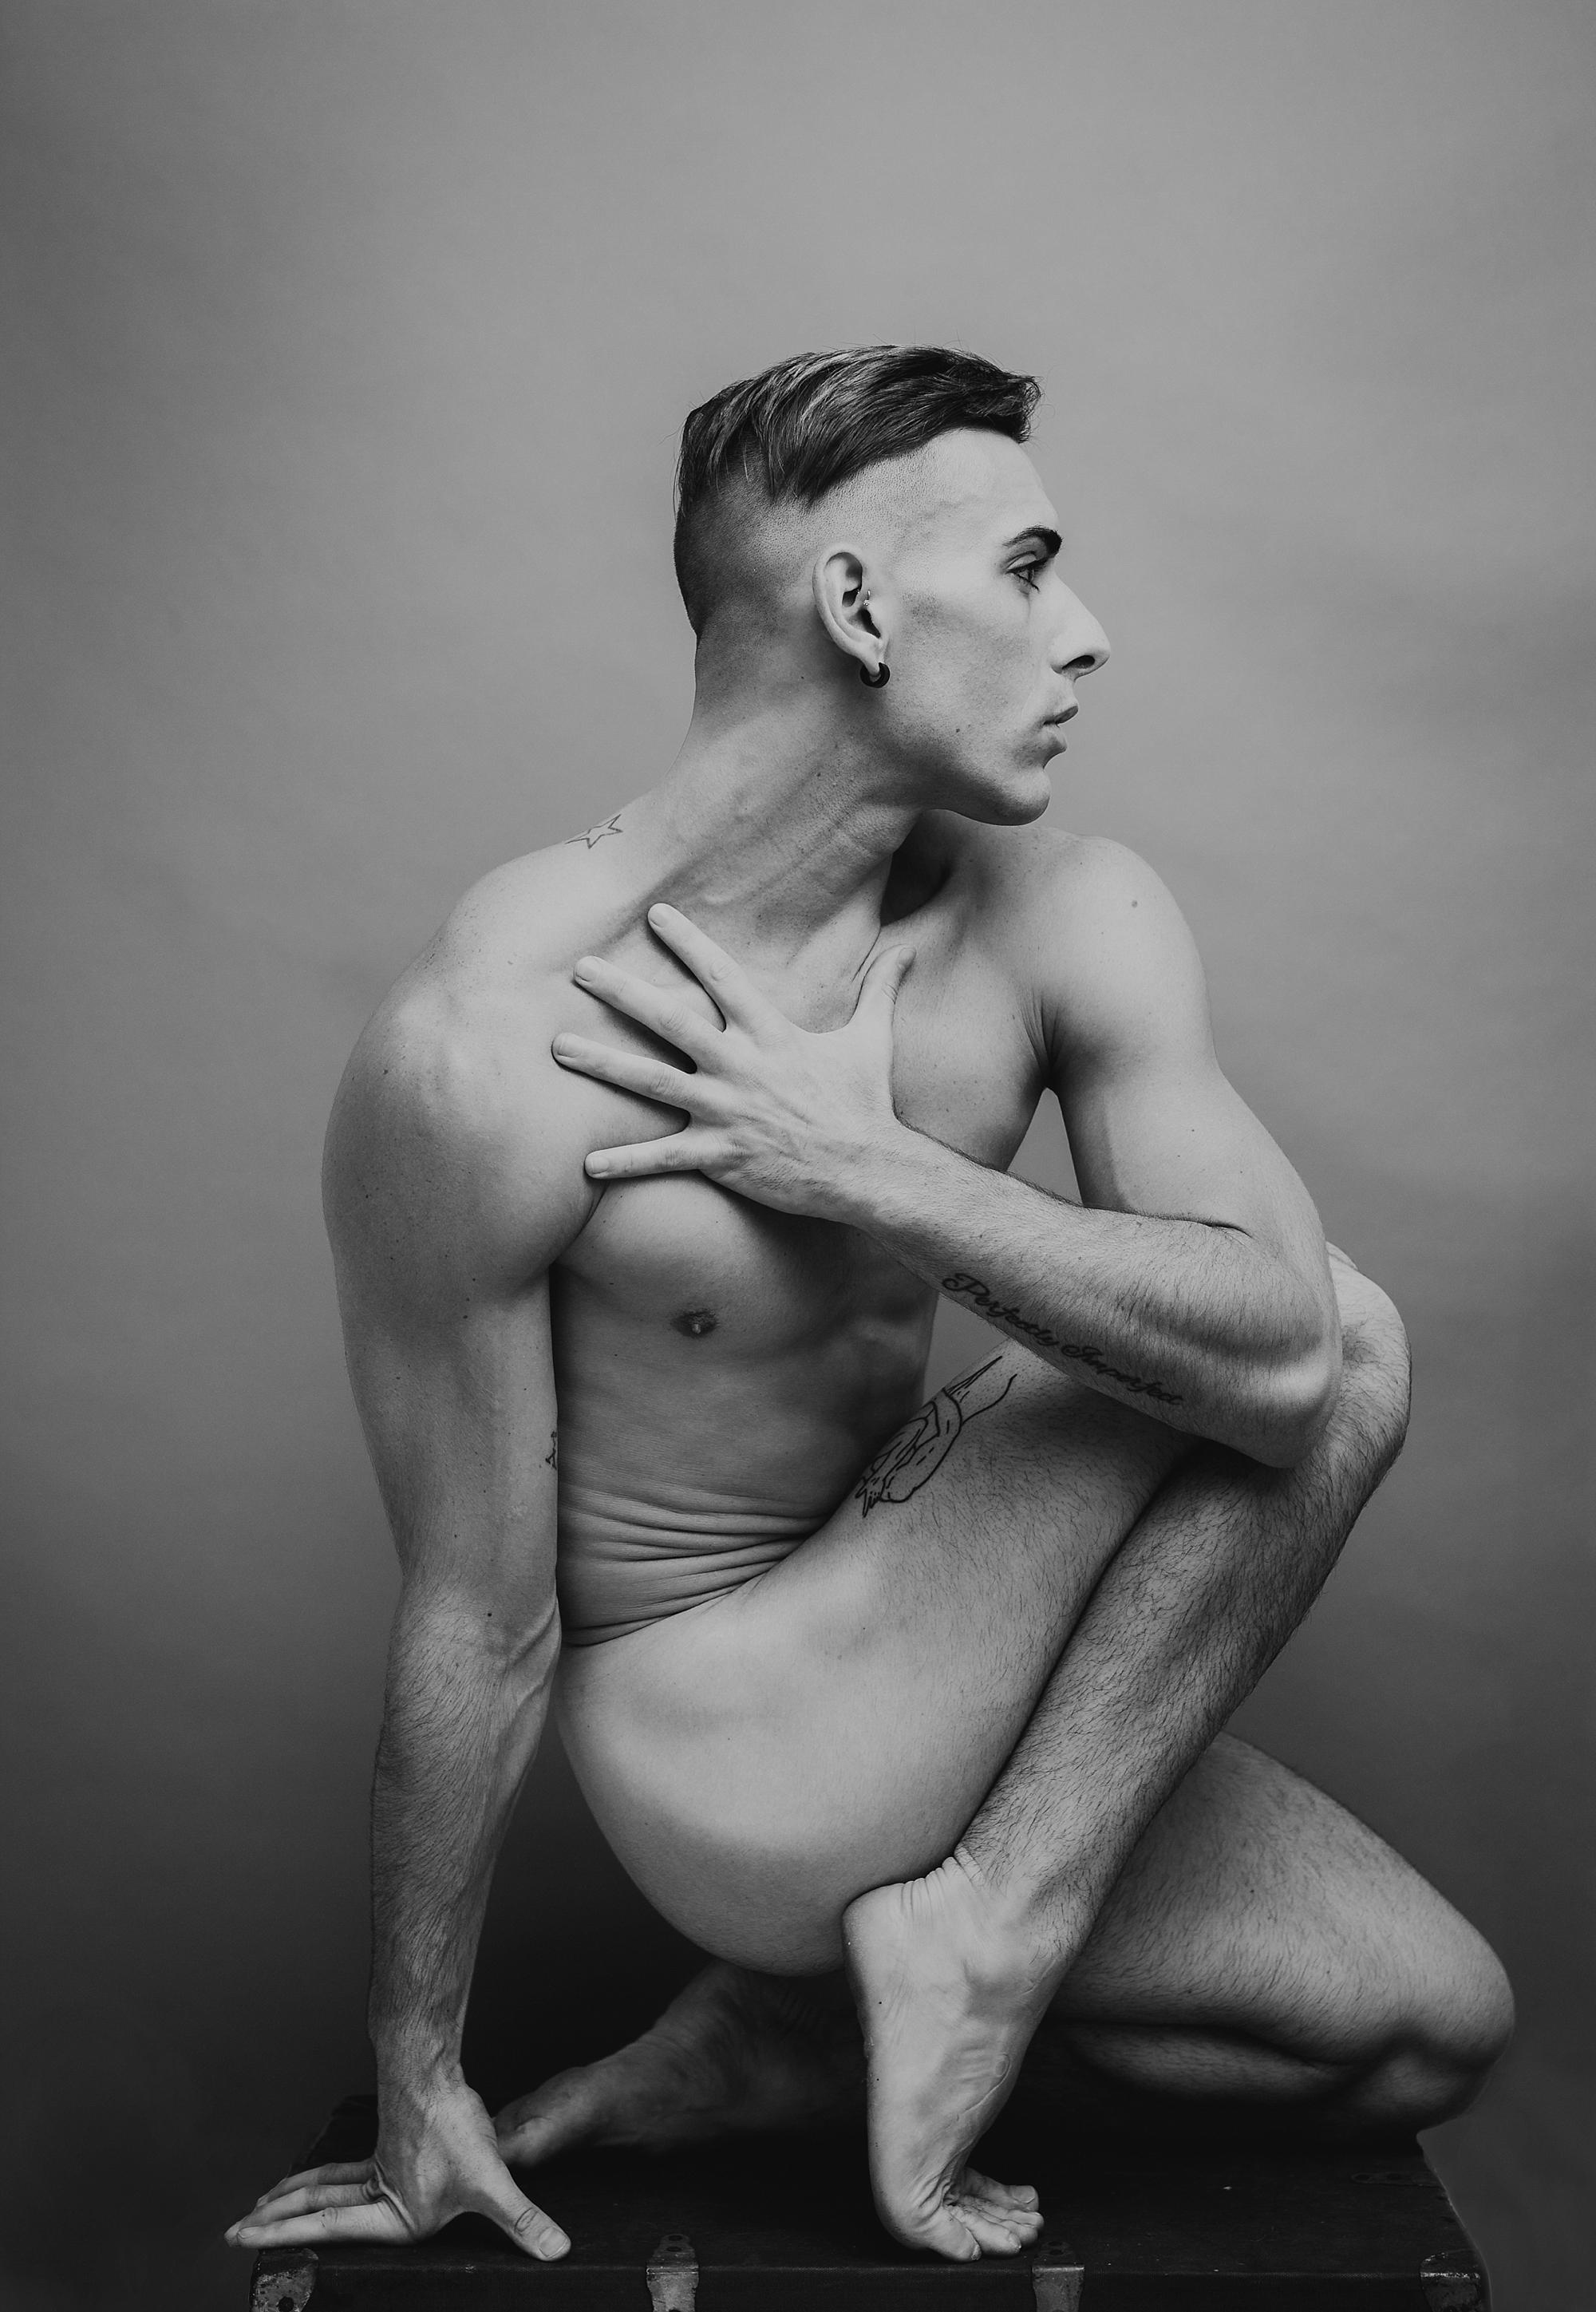 Joe_Mac_Creative_Joey_Arrigo_Philadelphia_Gay_Fashion_Photography__0010.jpg